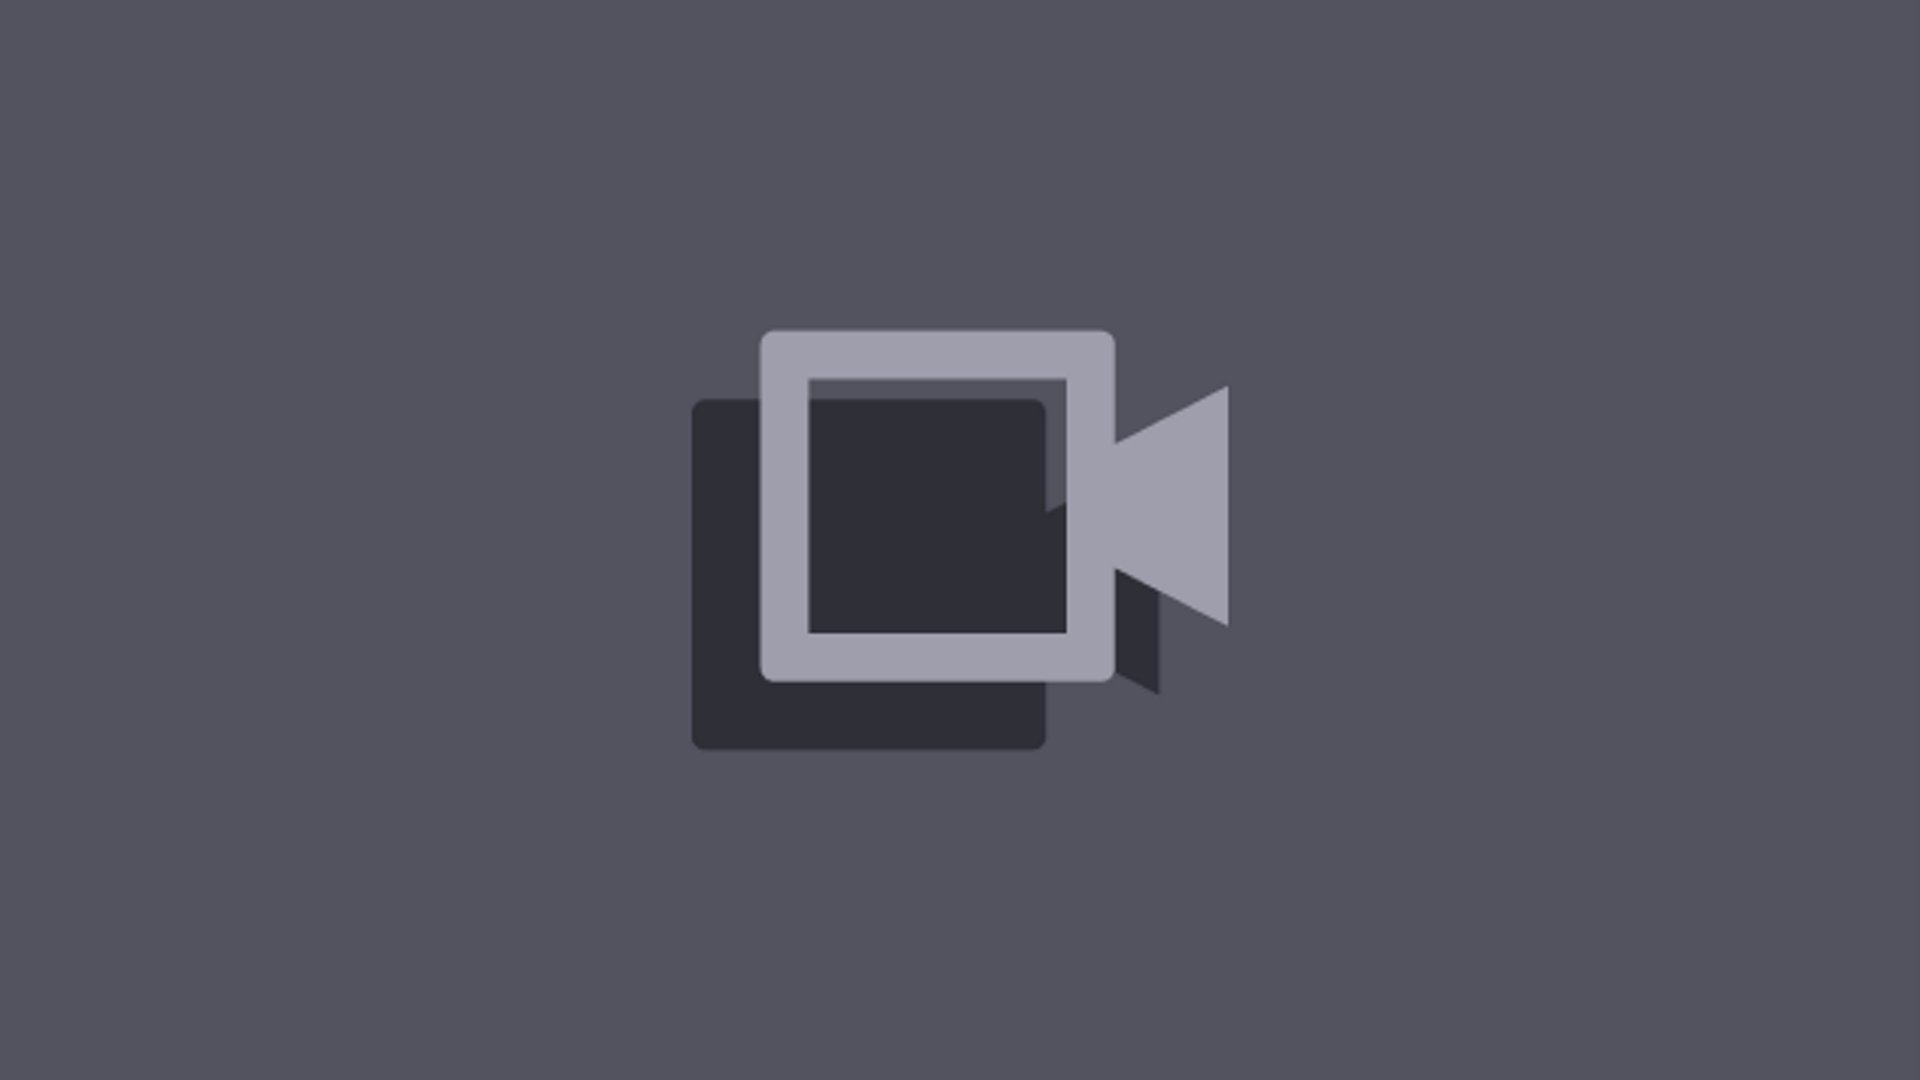 https://static-cdn.jtvnw.net/jtv_user_pictures/3714948a-2fcd-4689-a3d9-aaa81f9d57c5-channel_offline_image-1920x1080.jpg